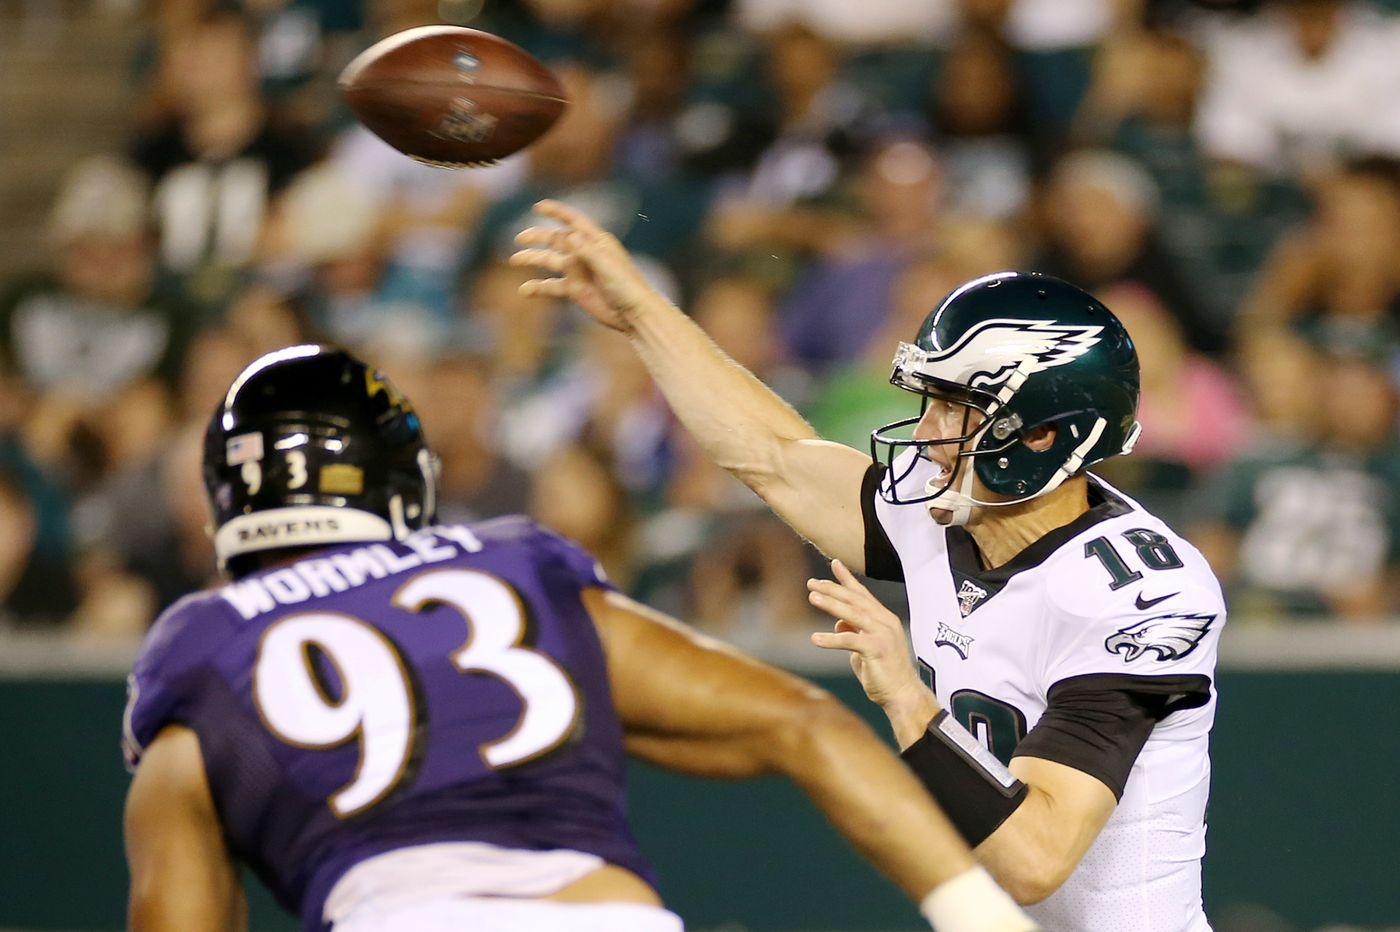 Eagles podcast: Josh McCown vs. the Ravens, debating the 53-man roster, who Joe Douglas might pick up